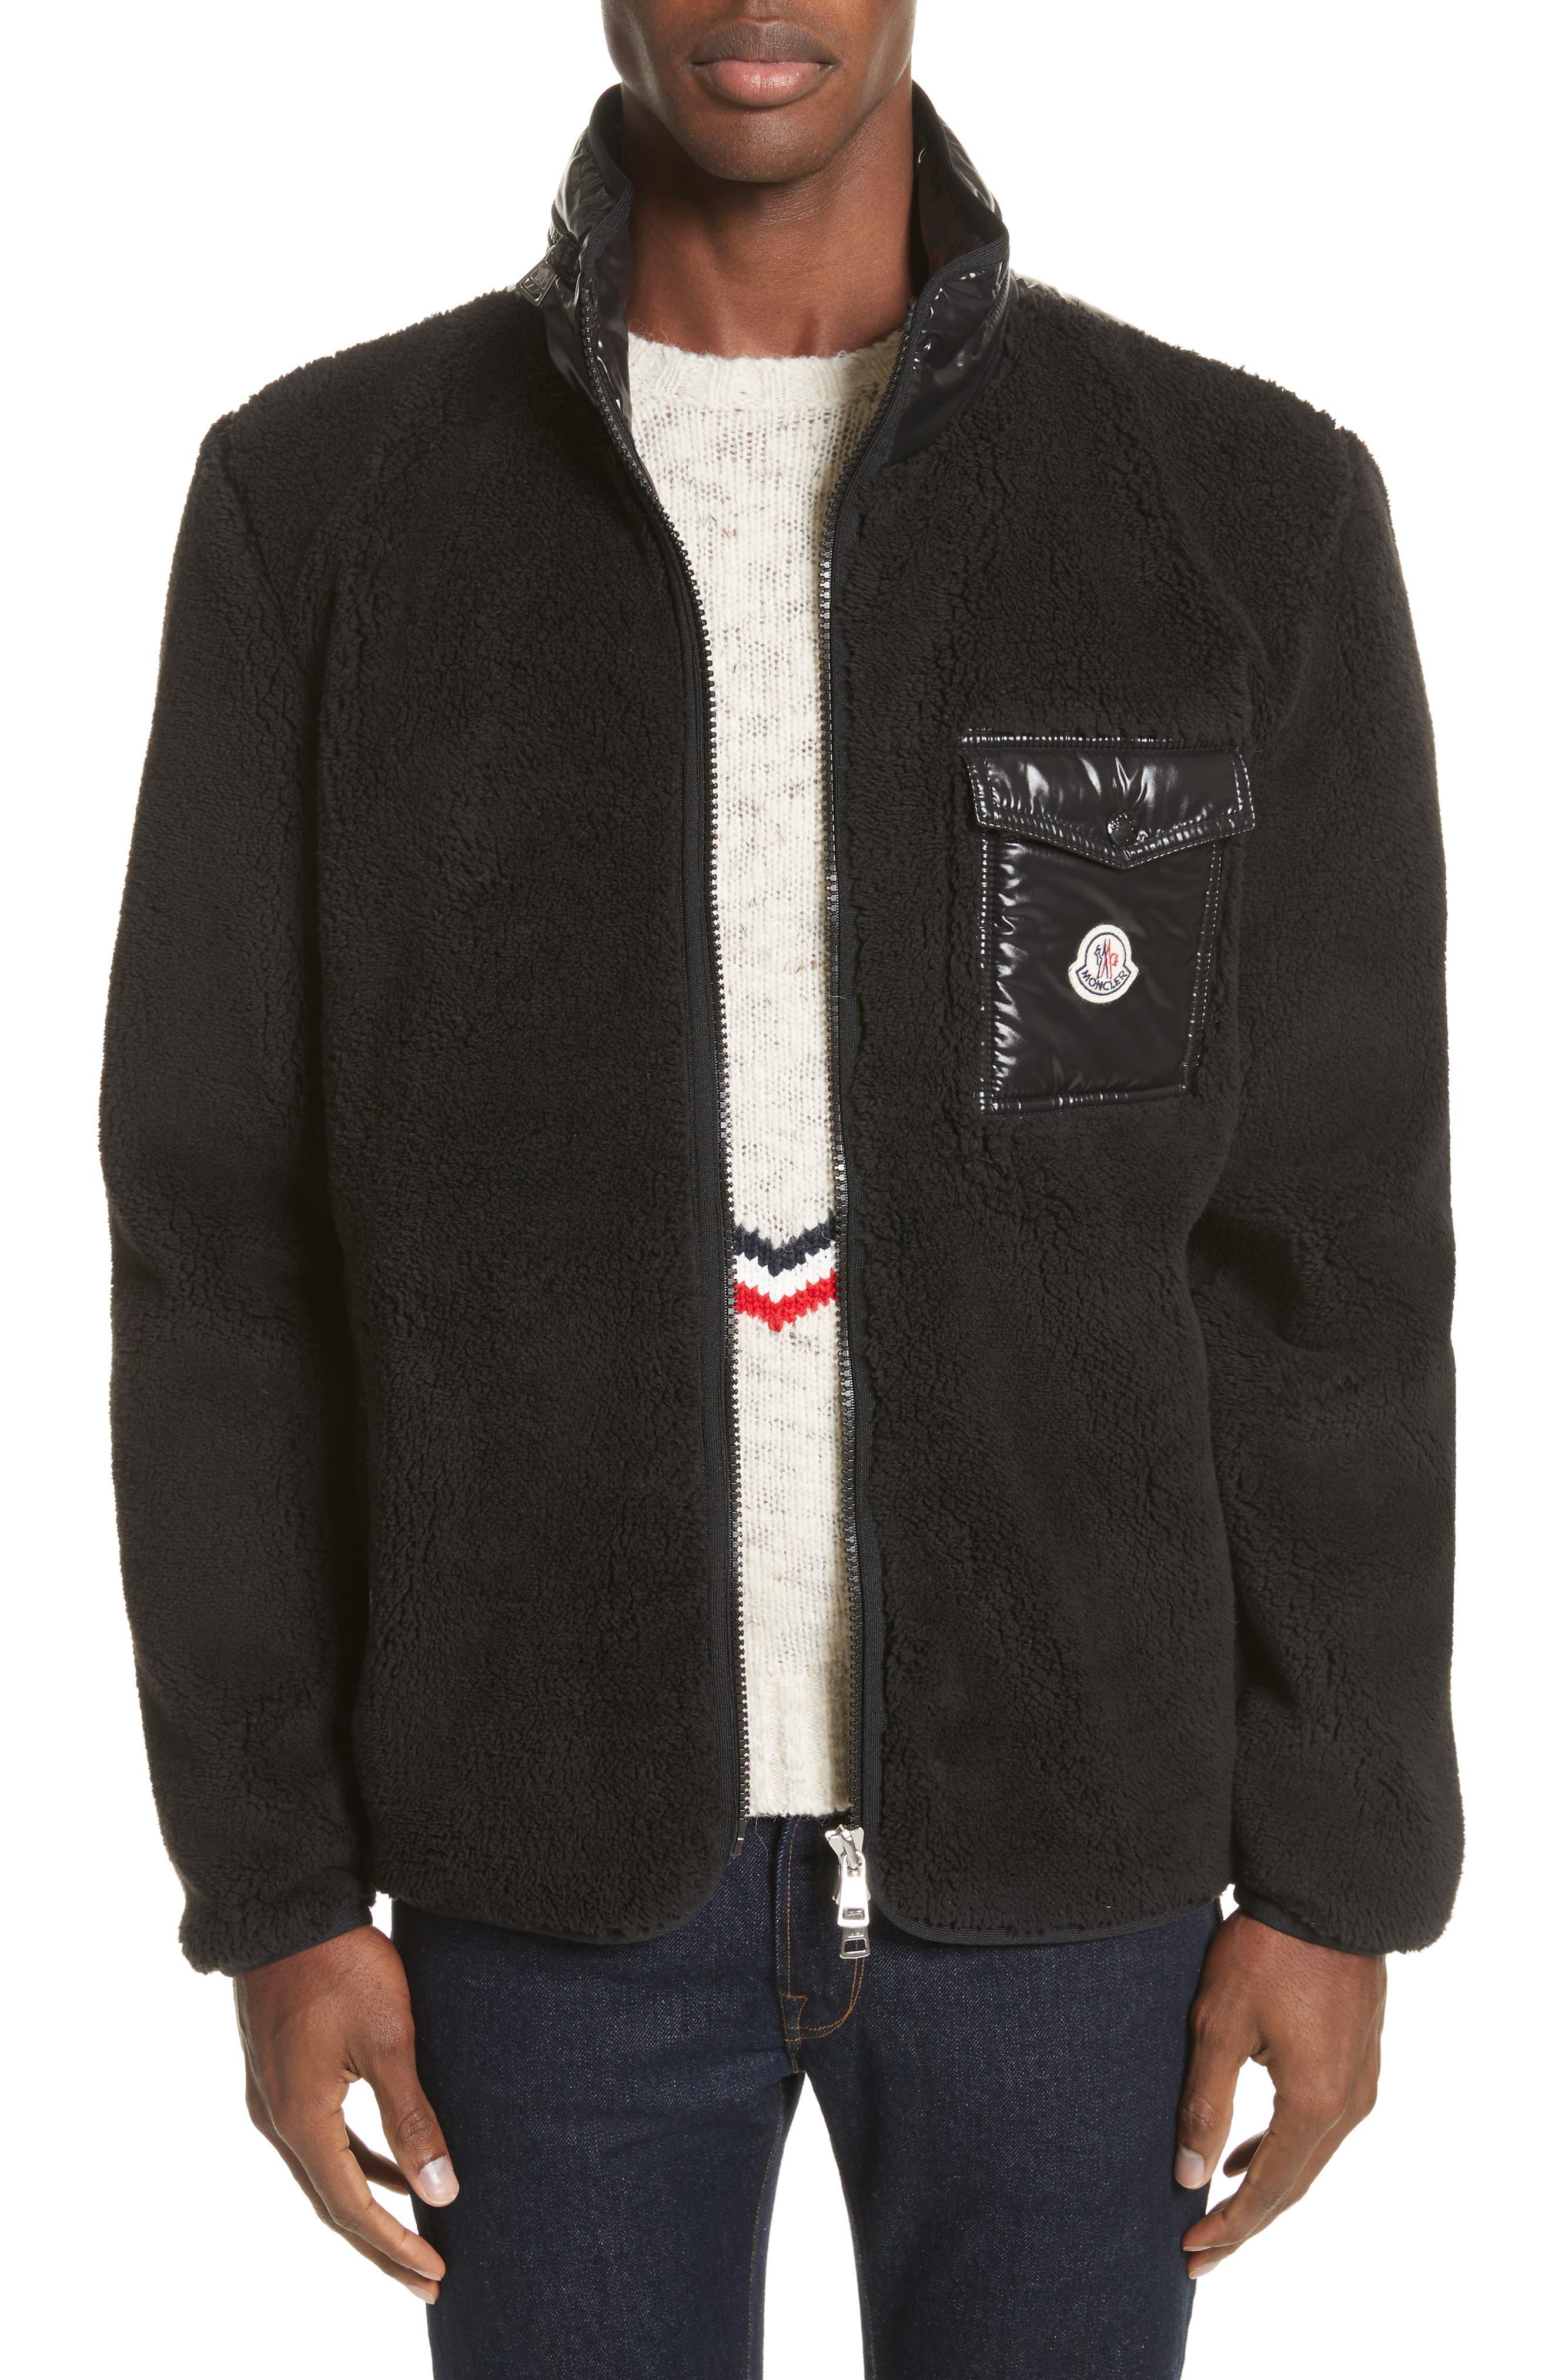 Polar Fleece Zip Jacket,                             Main thumbnail 1, color,                             001